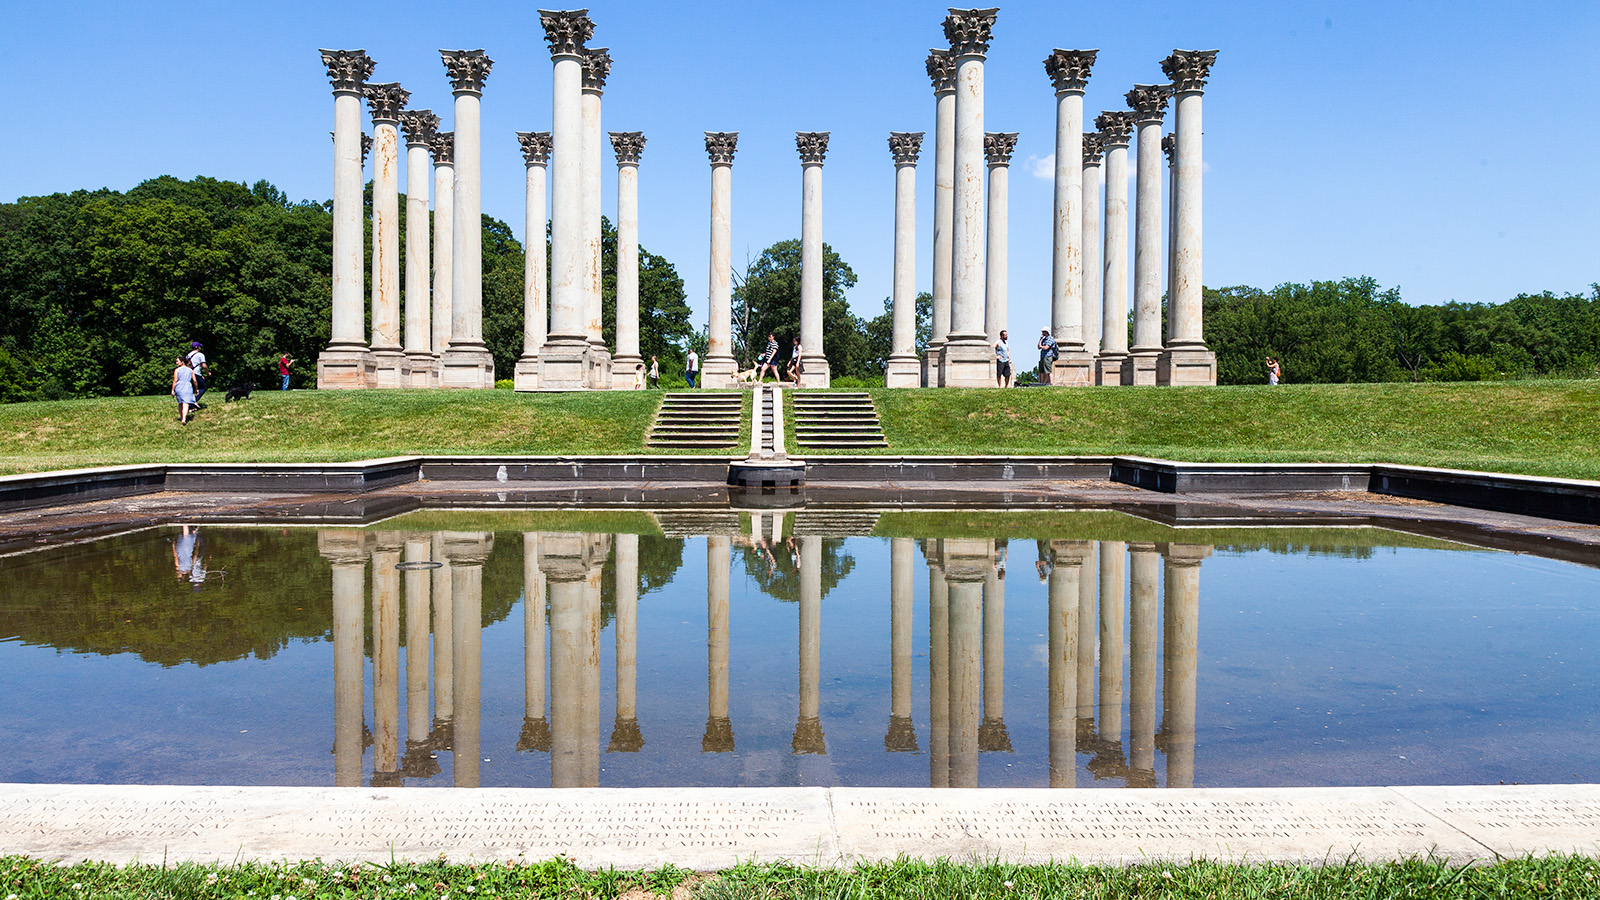 National Arboretum The Cultural Landscape Foundation